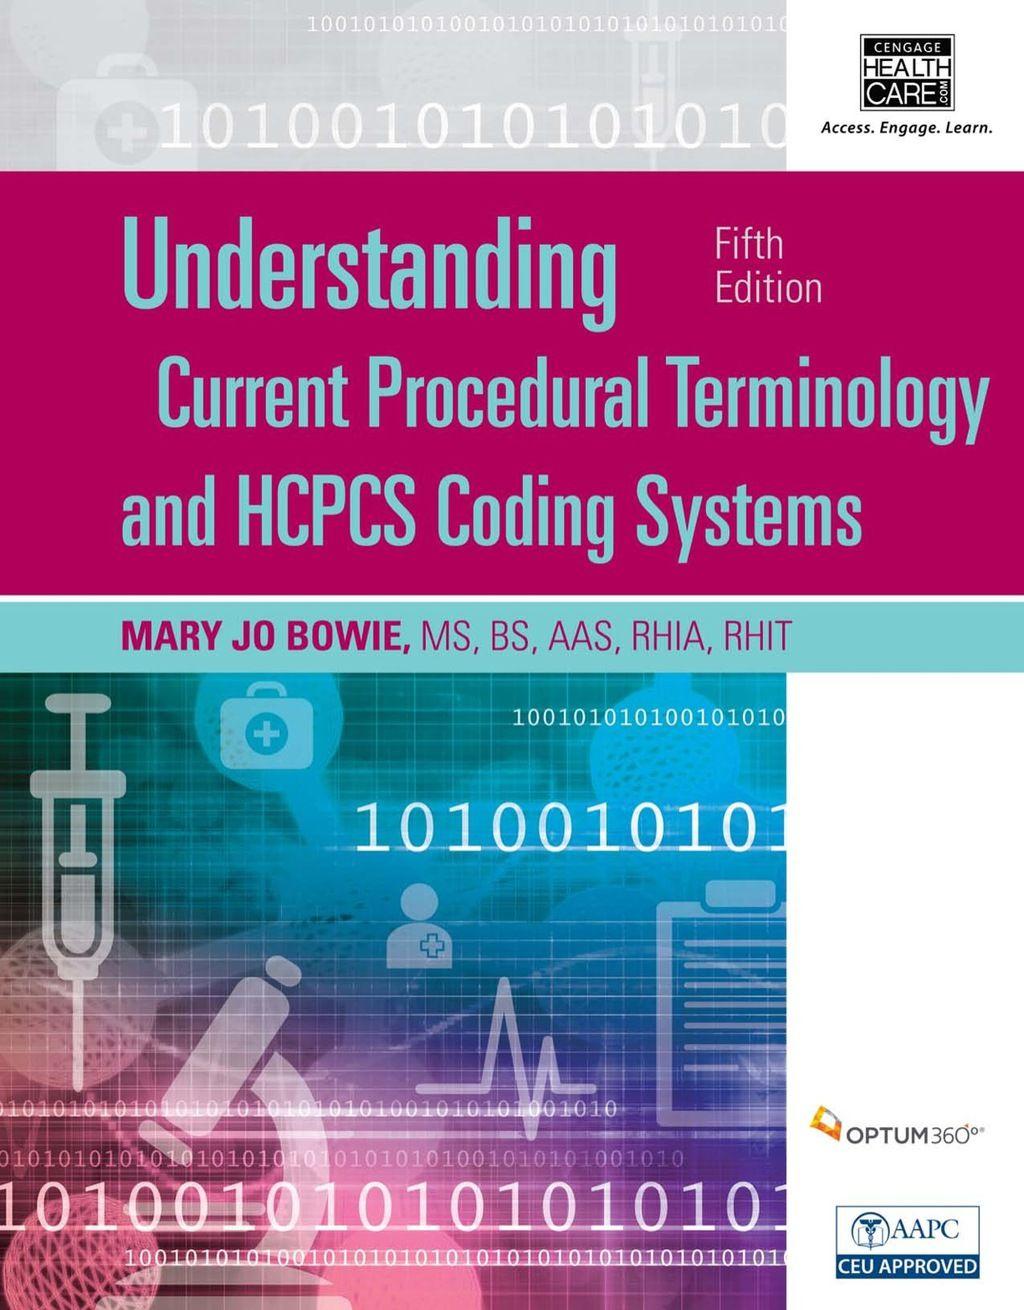 Understanding Current Procedural Terminology and HCPCS